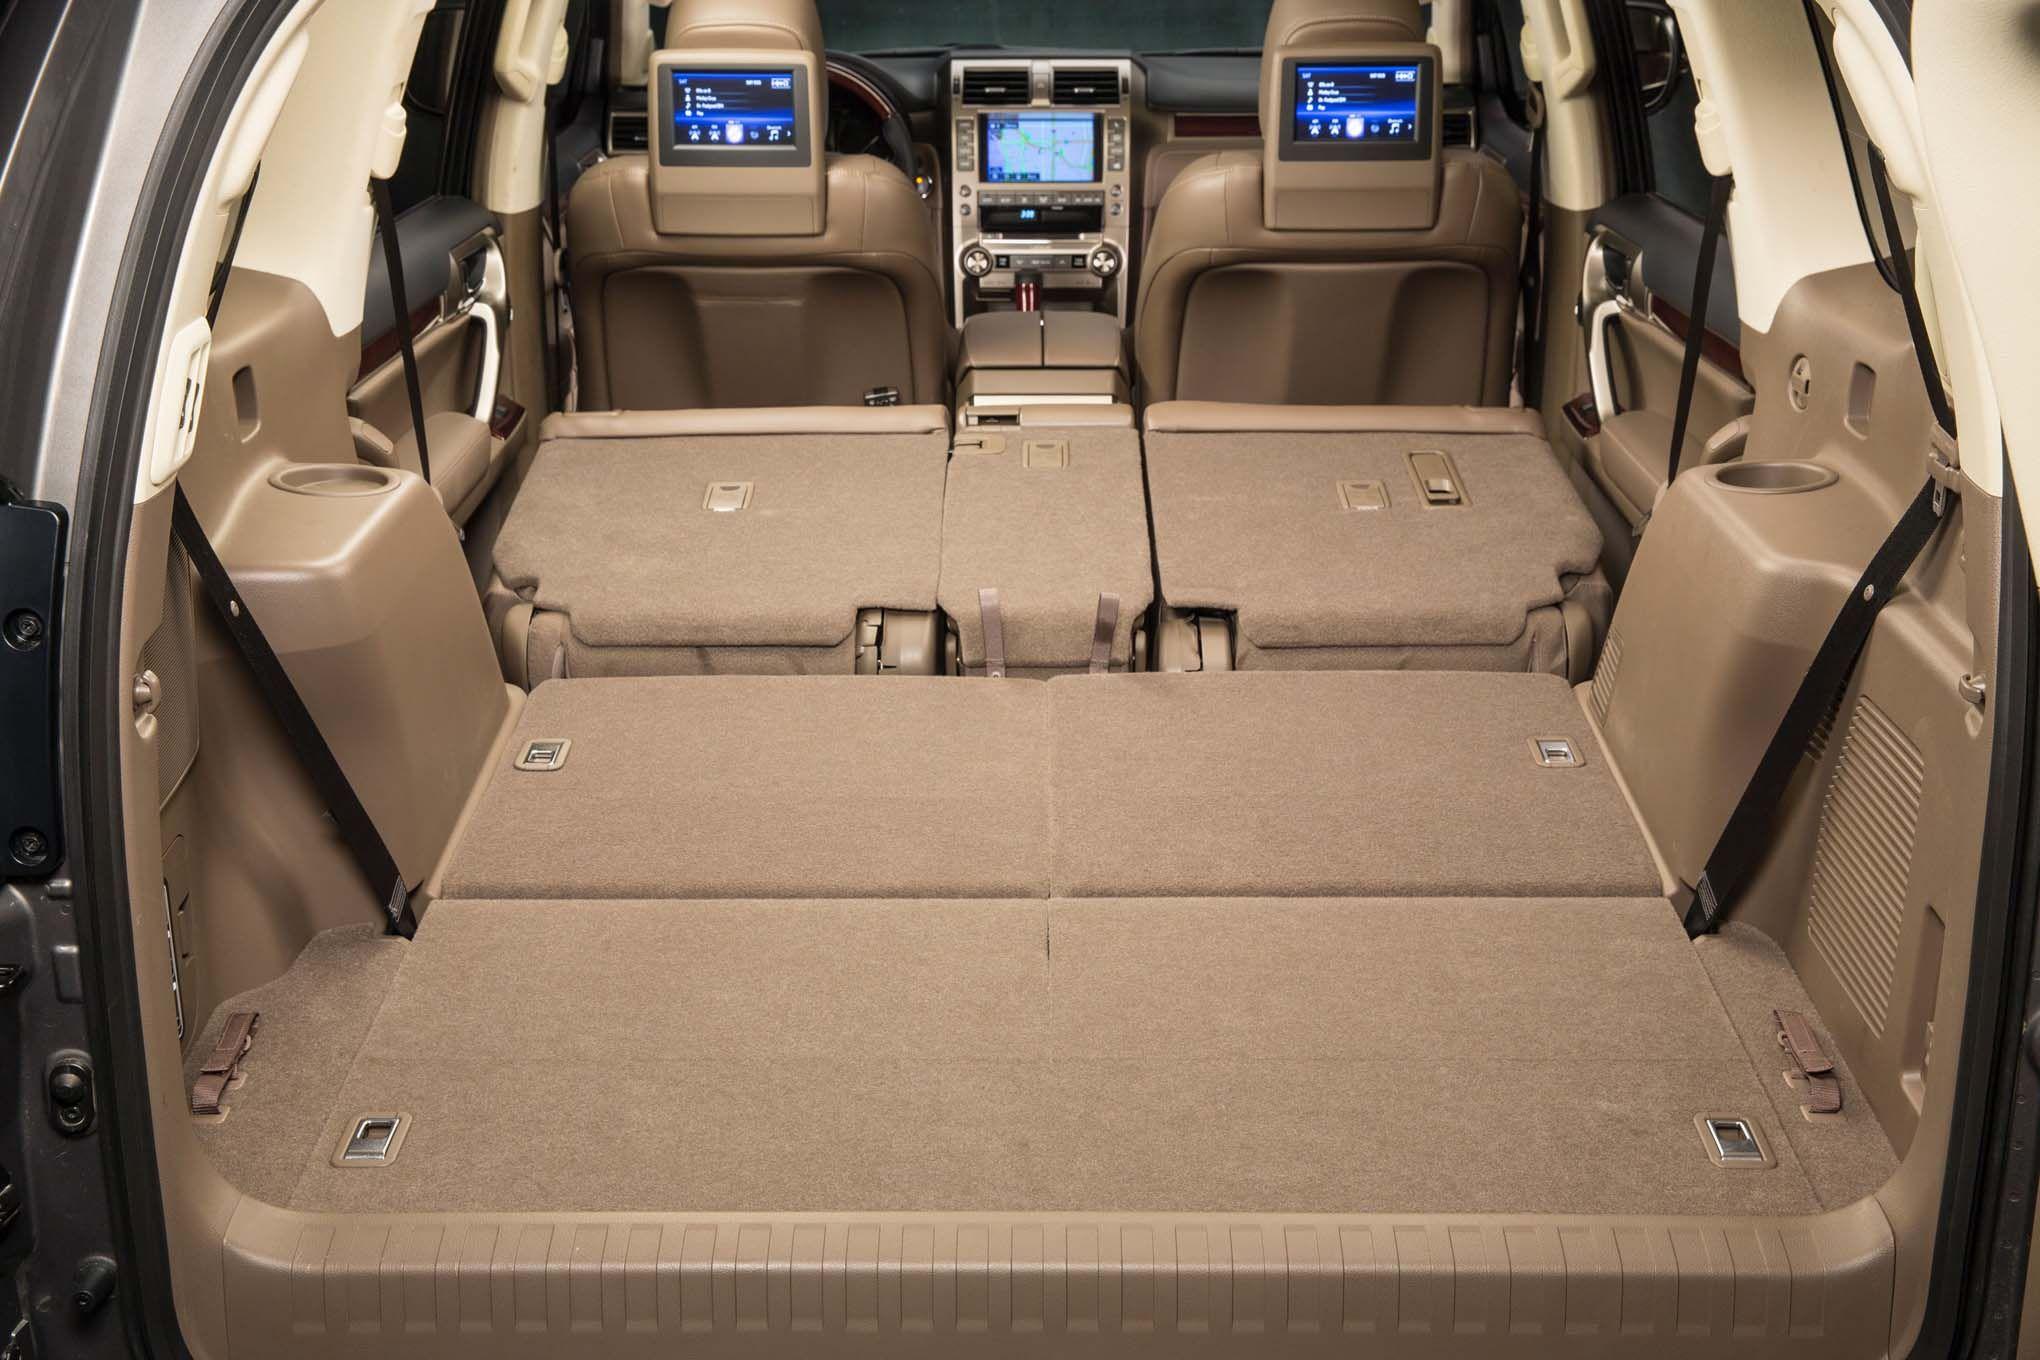 2019 lexus gx460 cargo space